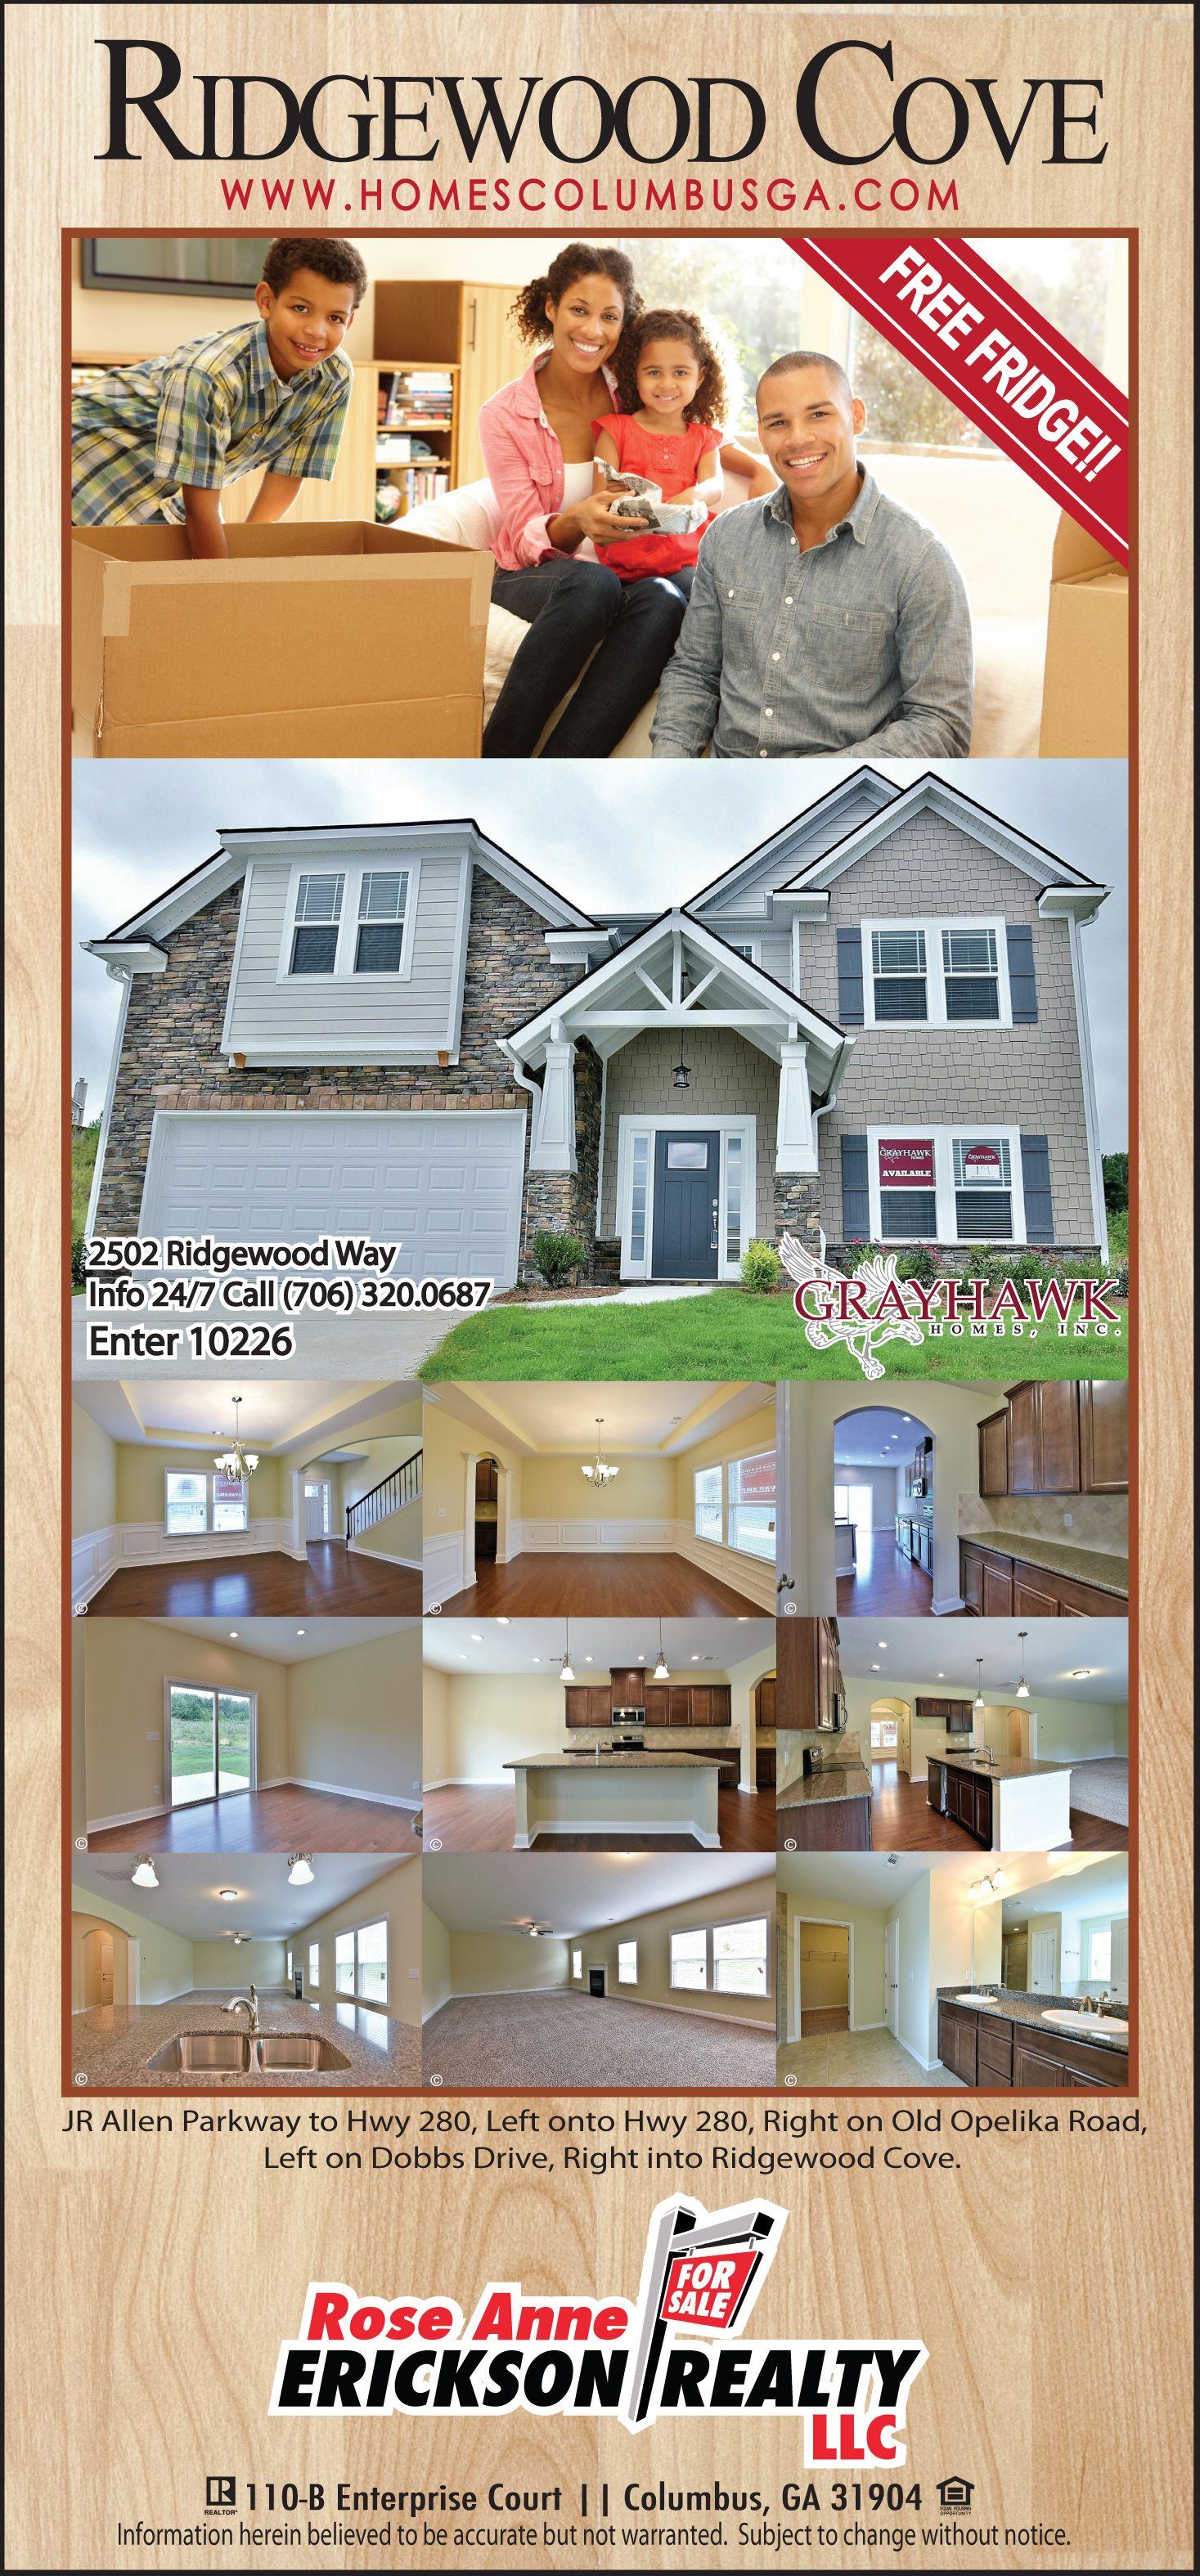 New Construction Homes in Ridgewood Cove off Dobbs Drive in Phenix City Alabama